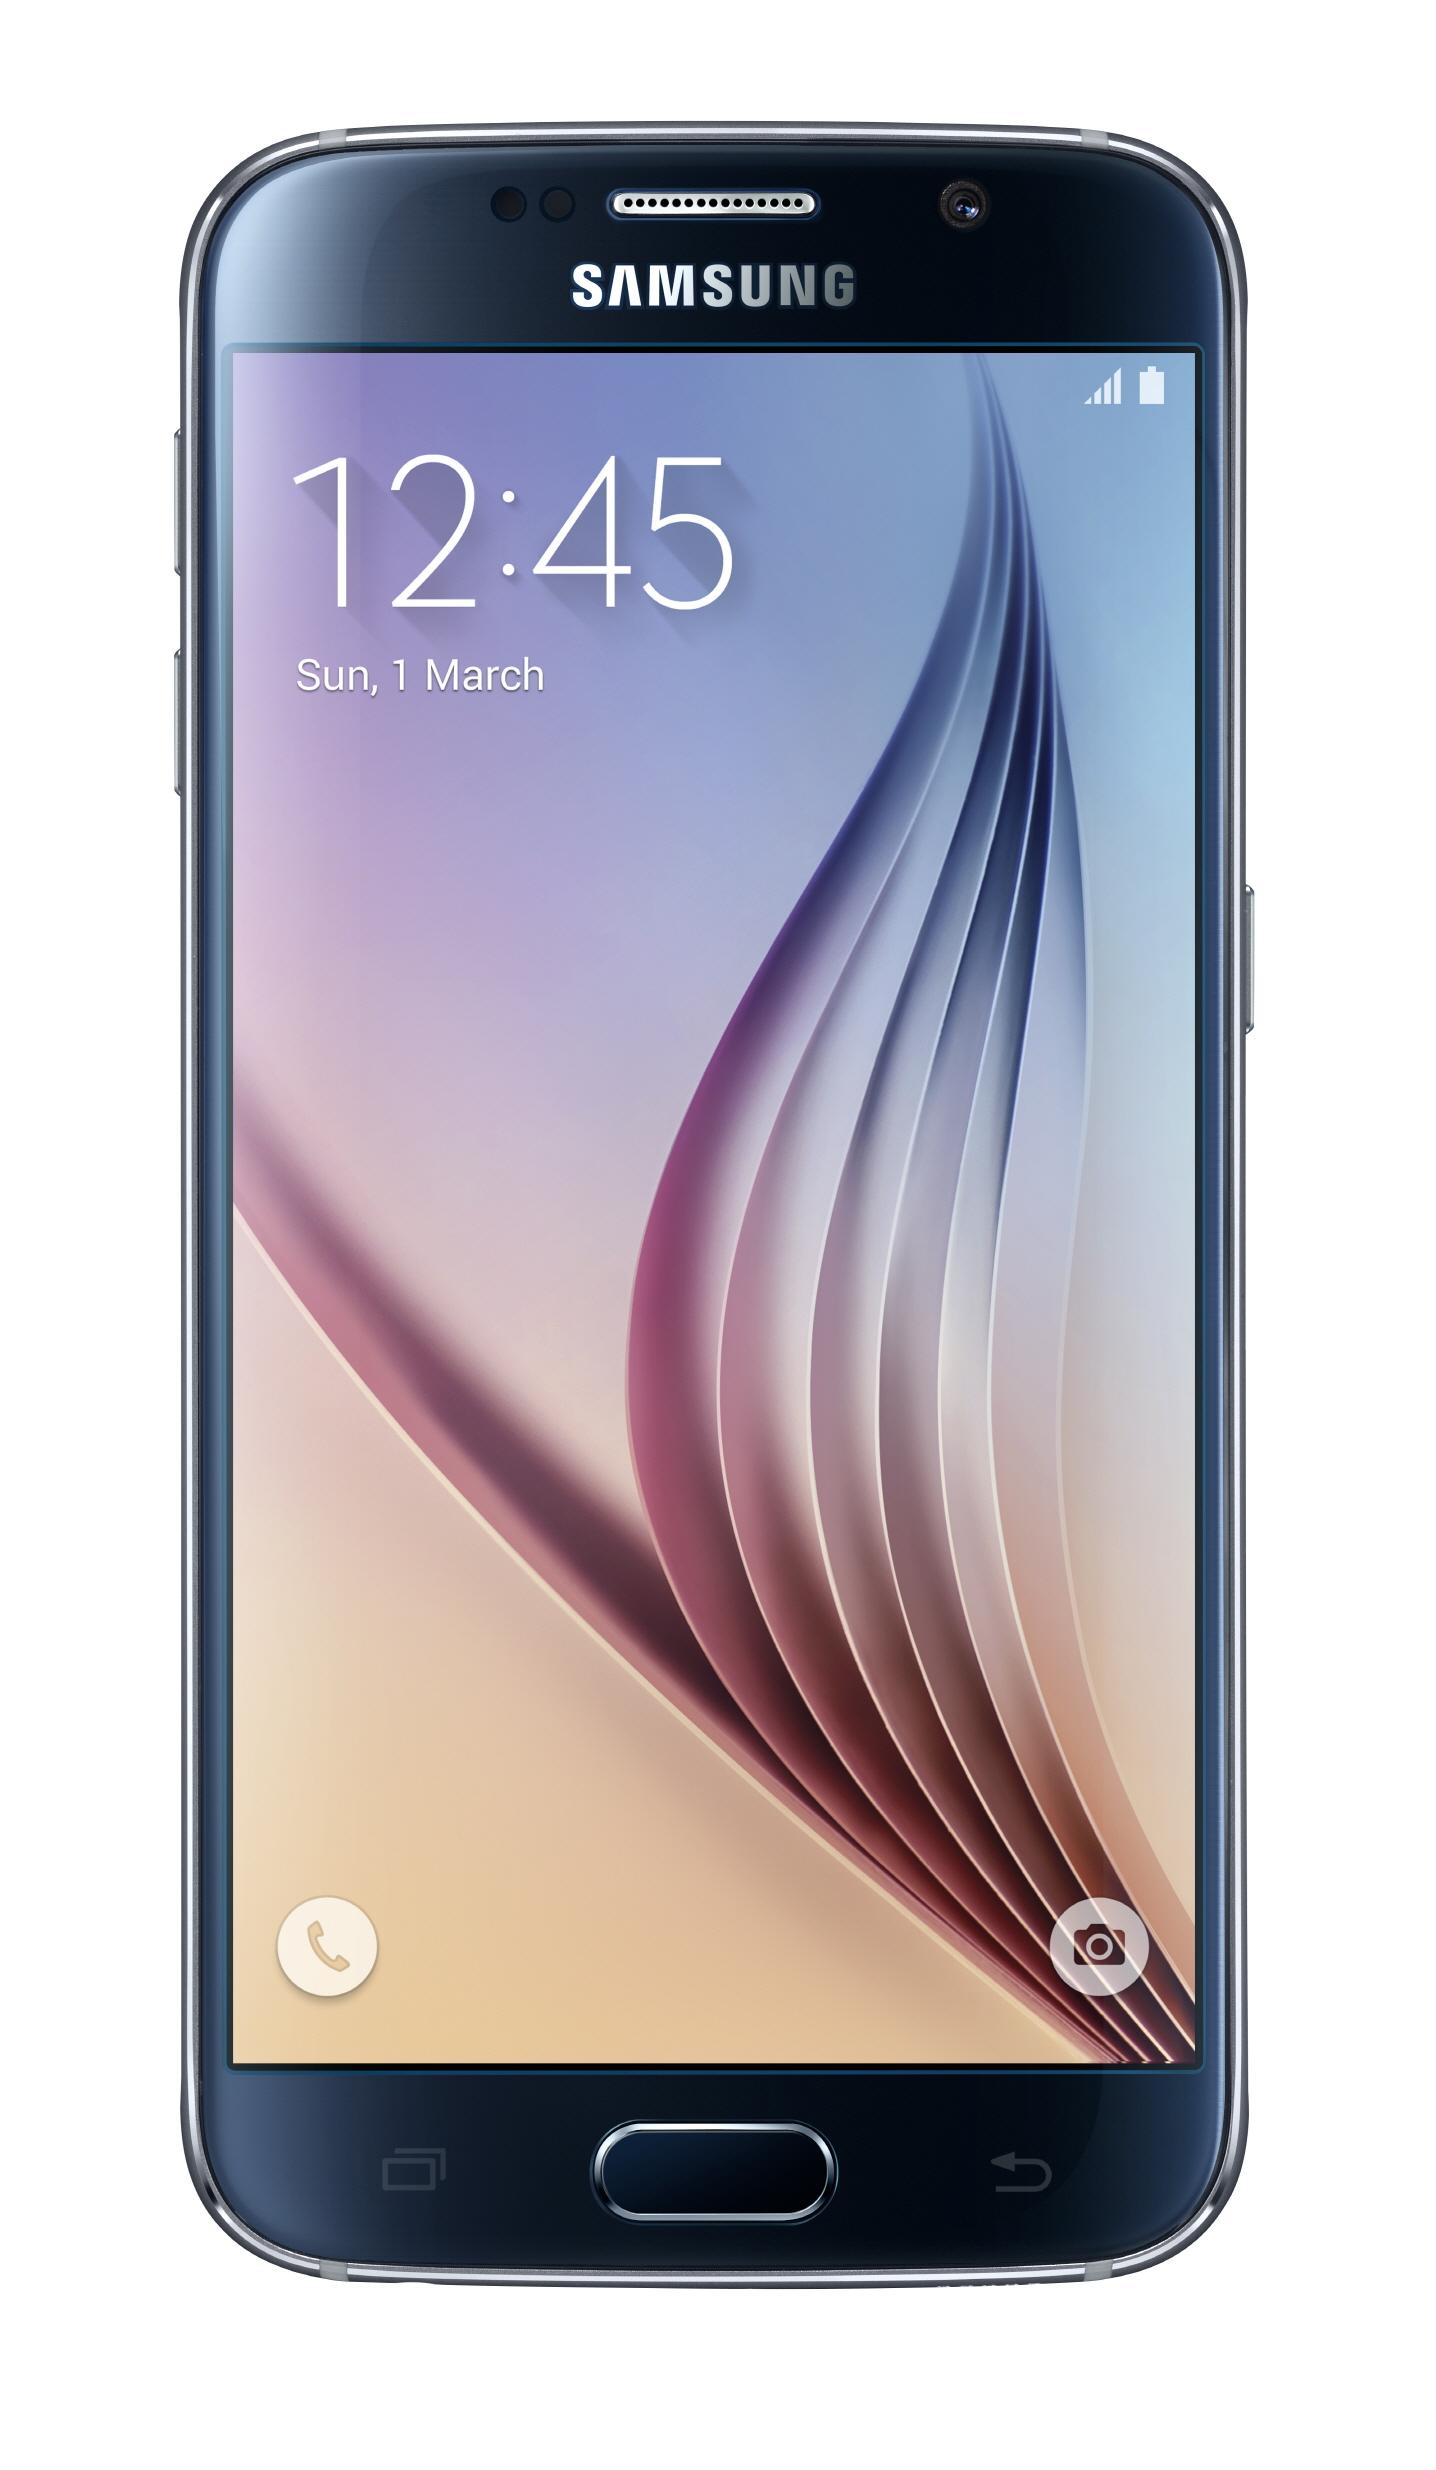 MWC 2015 - Samsung Galaxy S6